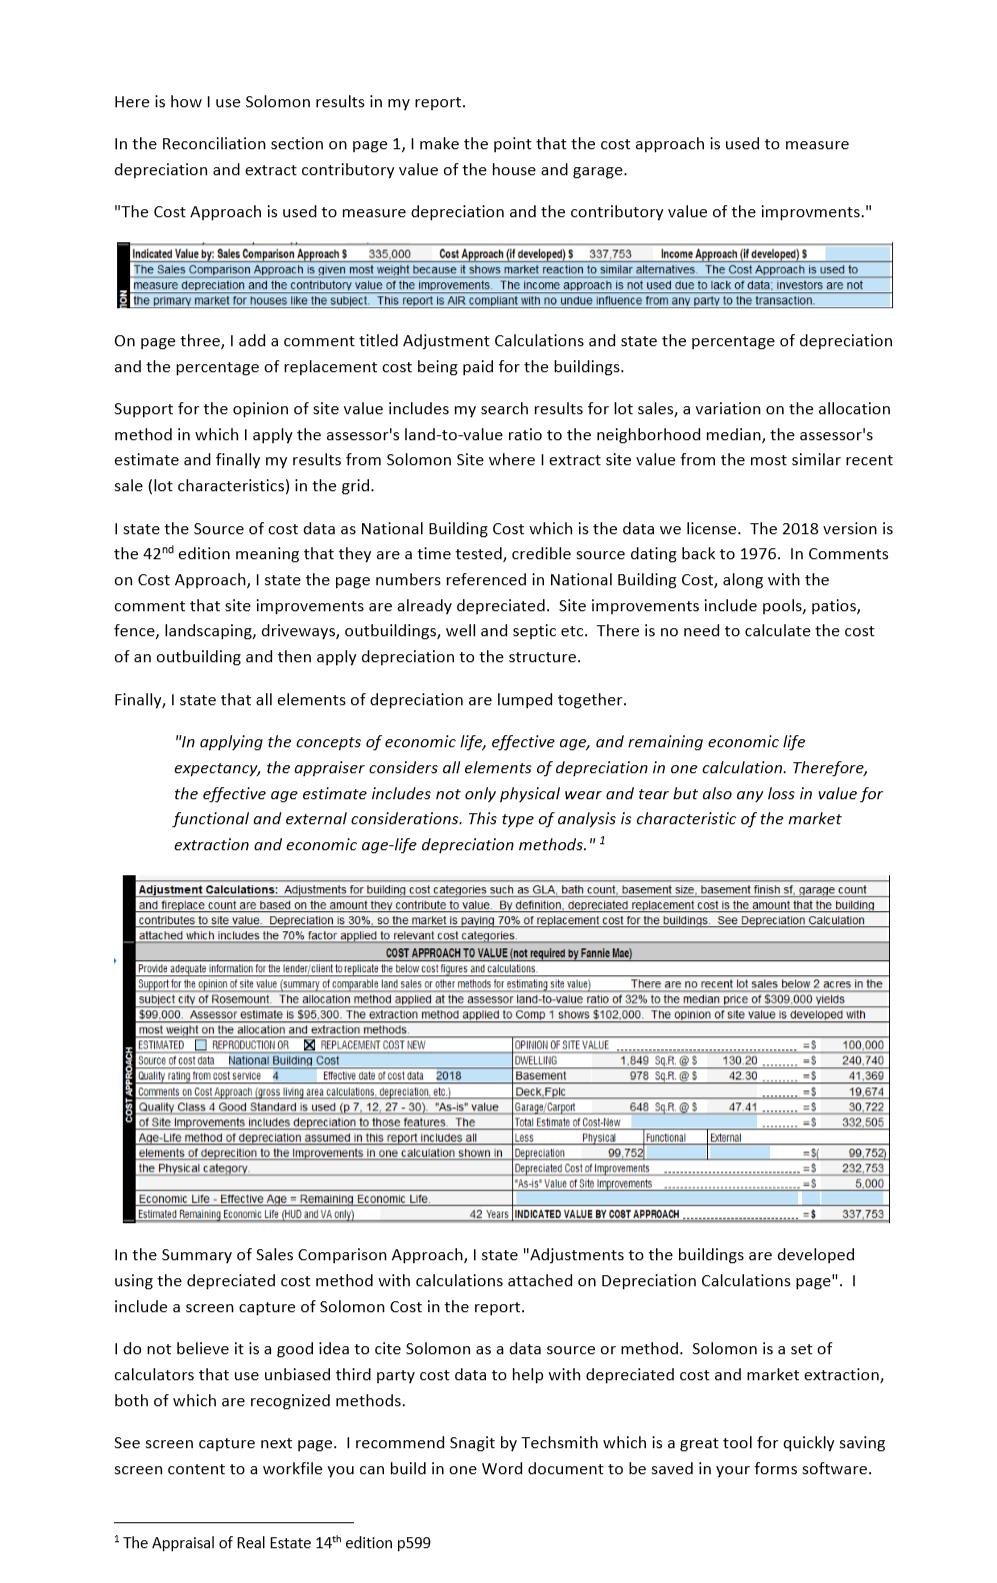 Reporting — Solomon Adjustment Calculator